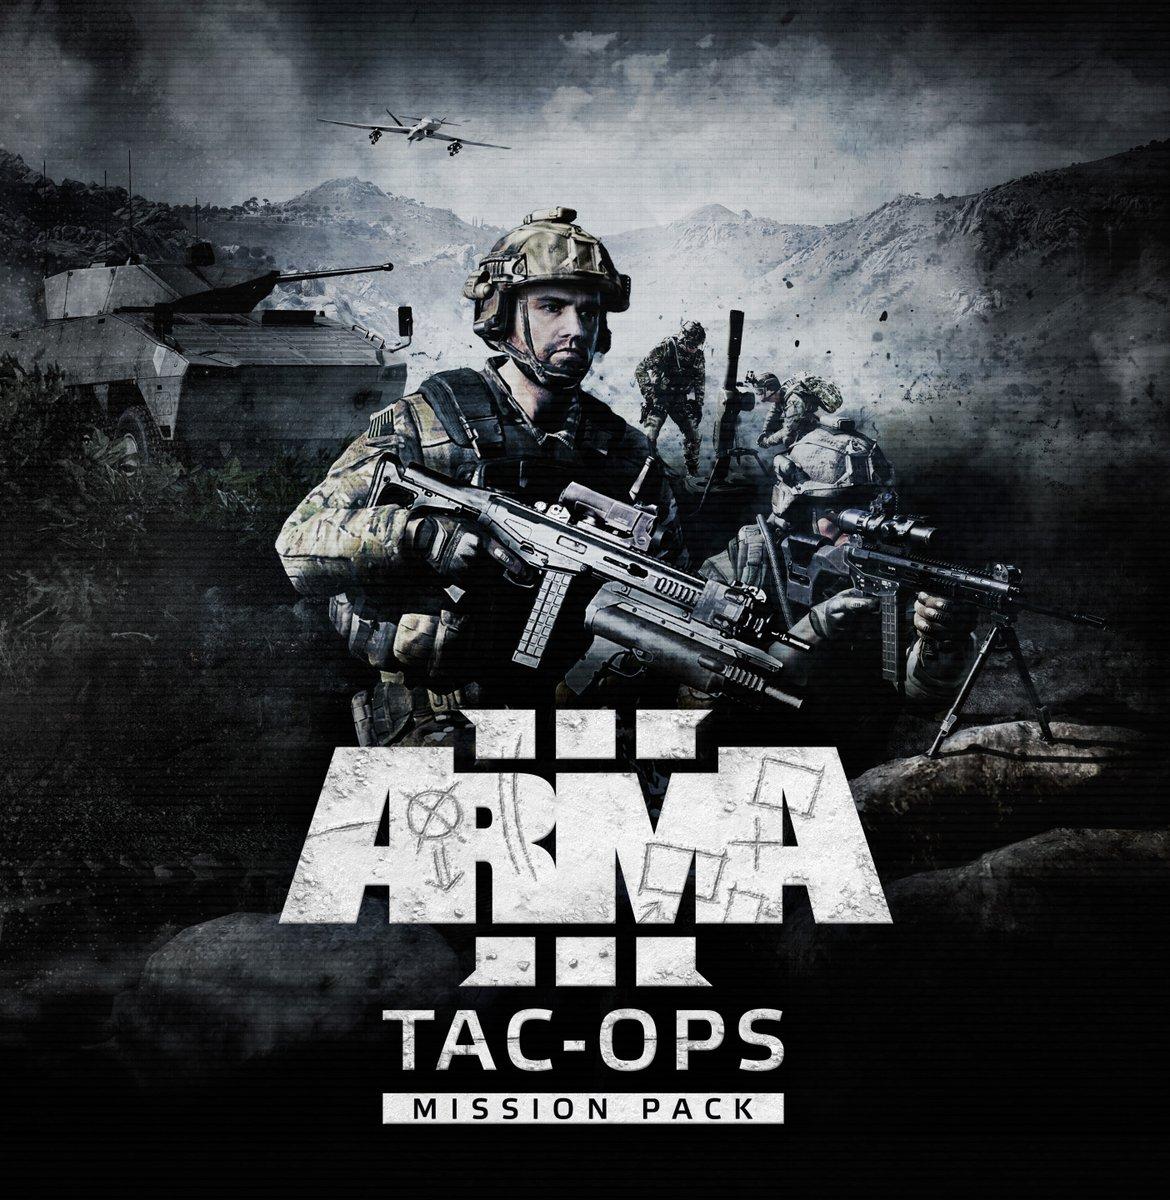 Tac-Ops DLC | Armed Assault Wiki | FANDOM powered by Wikia